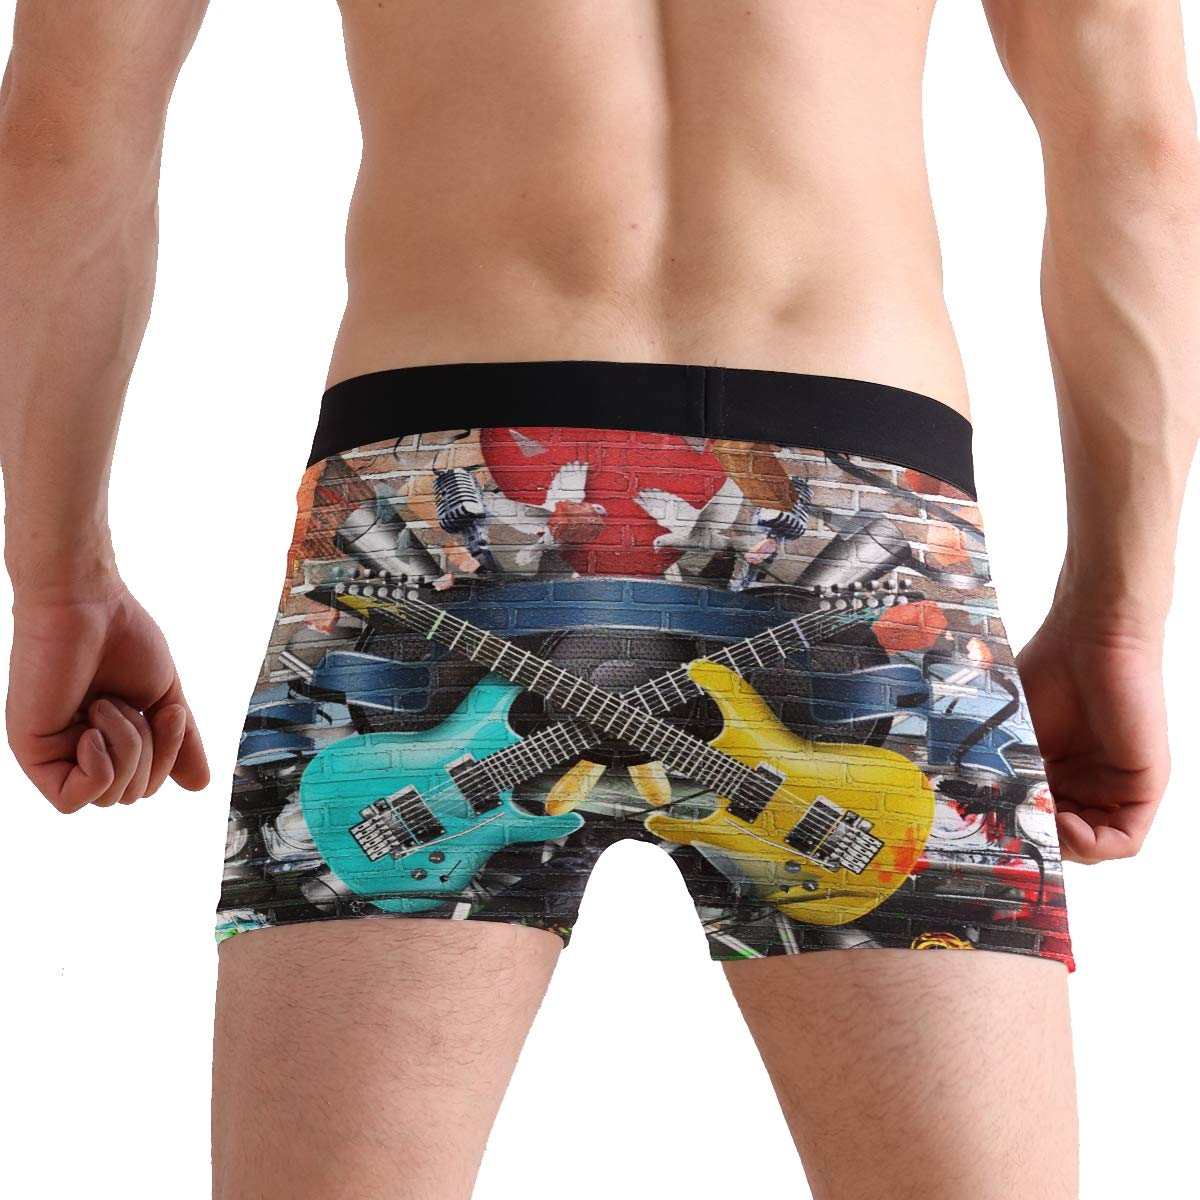 Wamika Color Guitar Men/'s Boxer Briefs Musical Underwear Stretchable S-XL